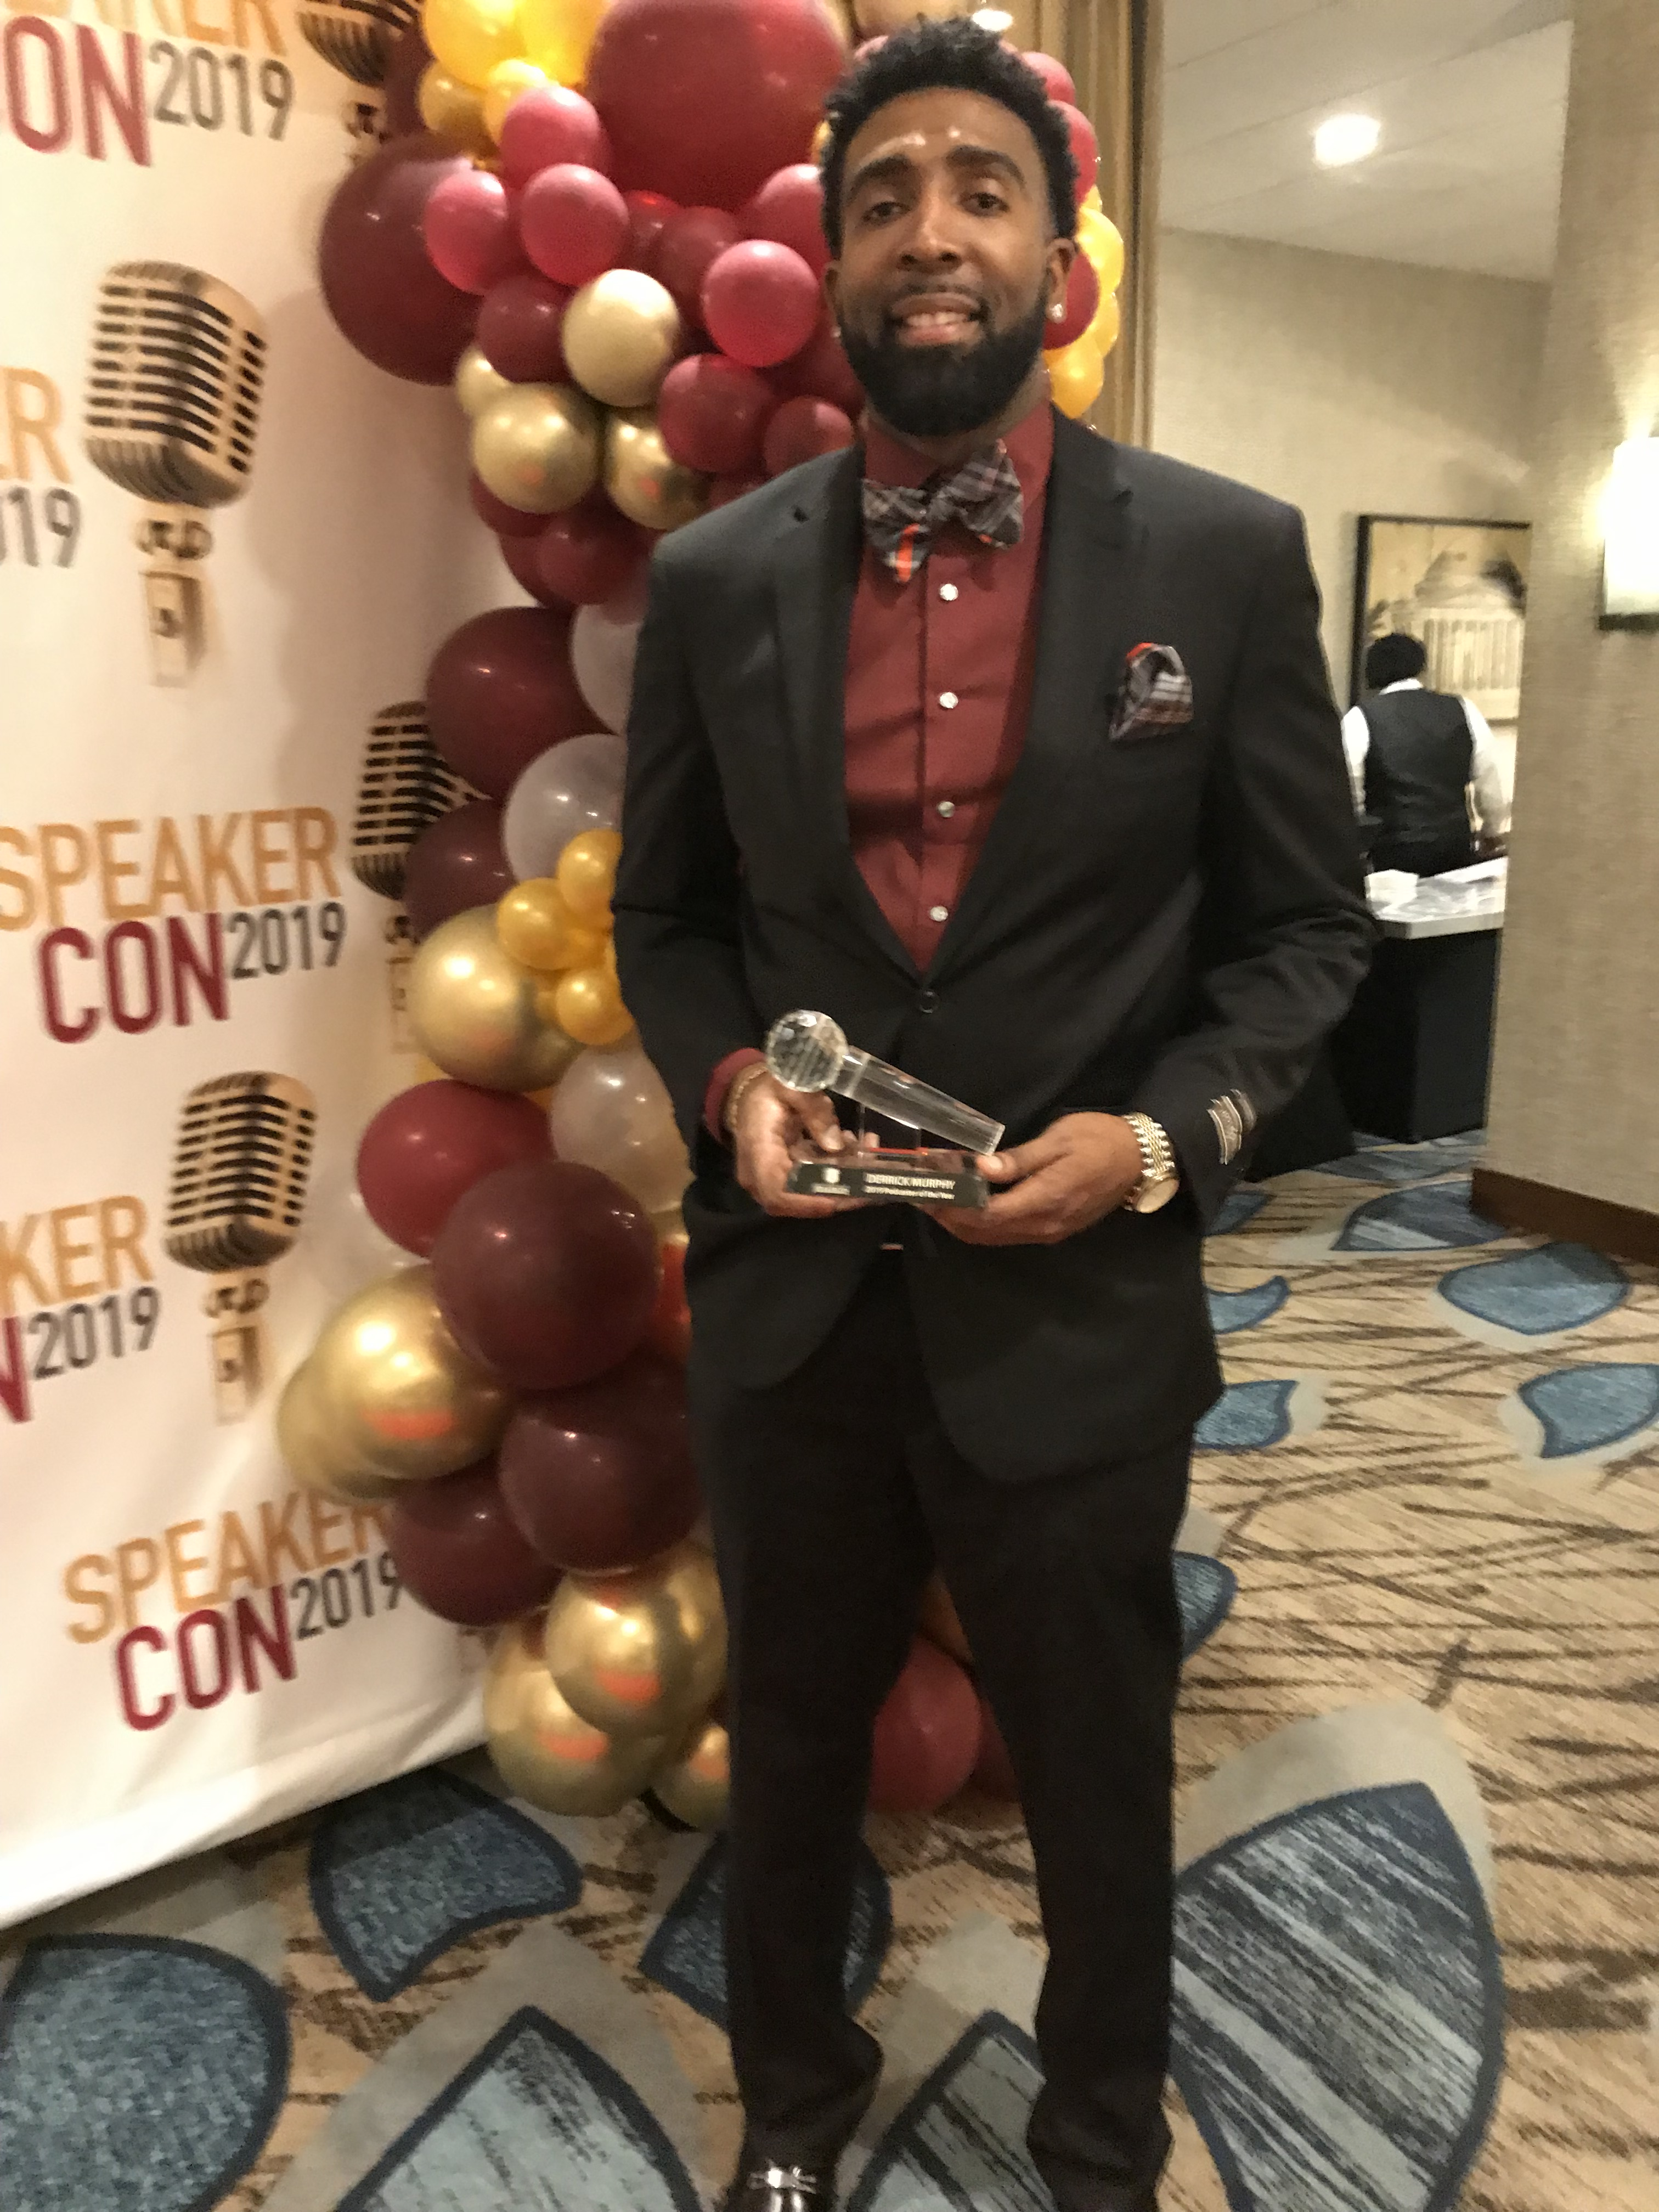 Derrick Murphy - 2019 Podcaster of the Year Recipient